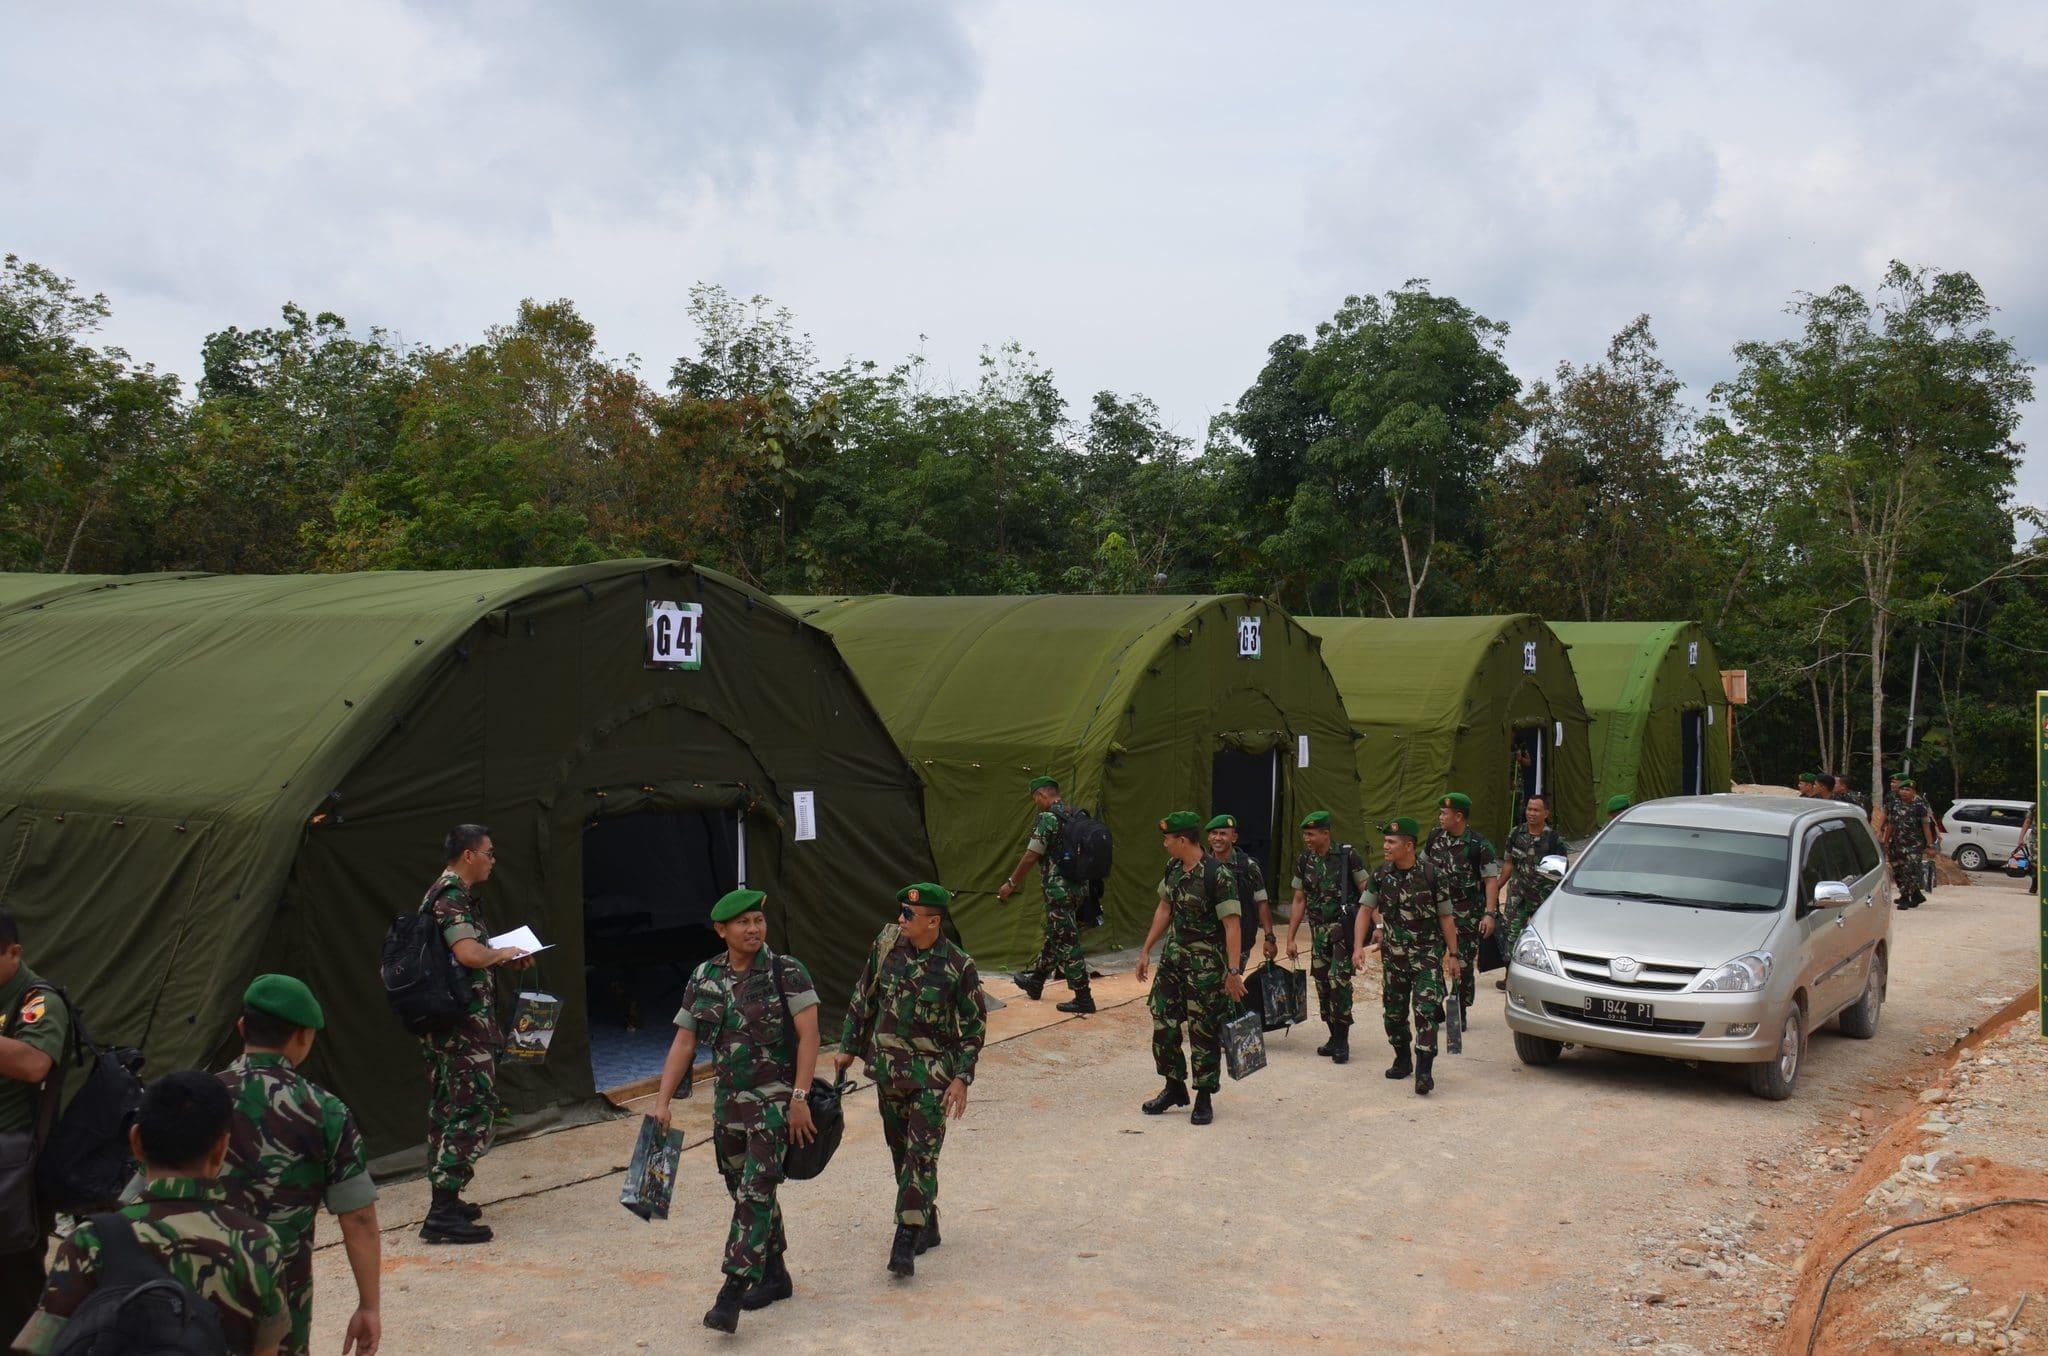 TNI AD GELAR APEL DANREM DANDIM TERPUSAT 2014 DI PANGKALAN BUN KALTENG